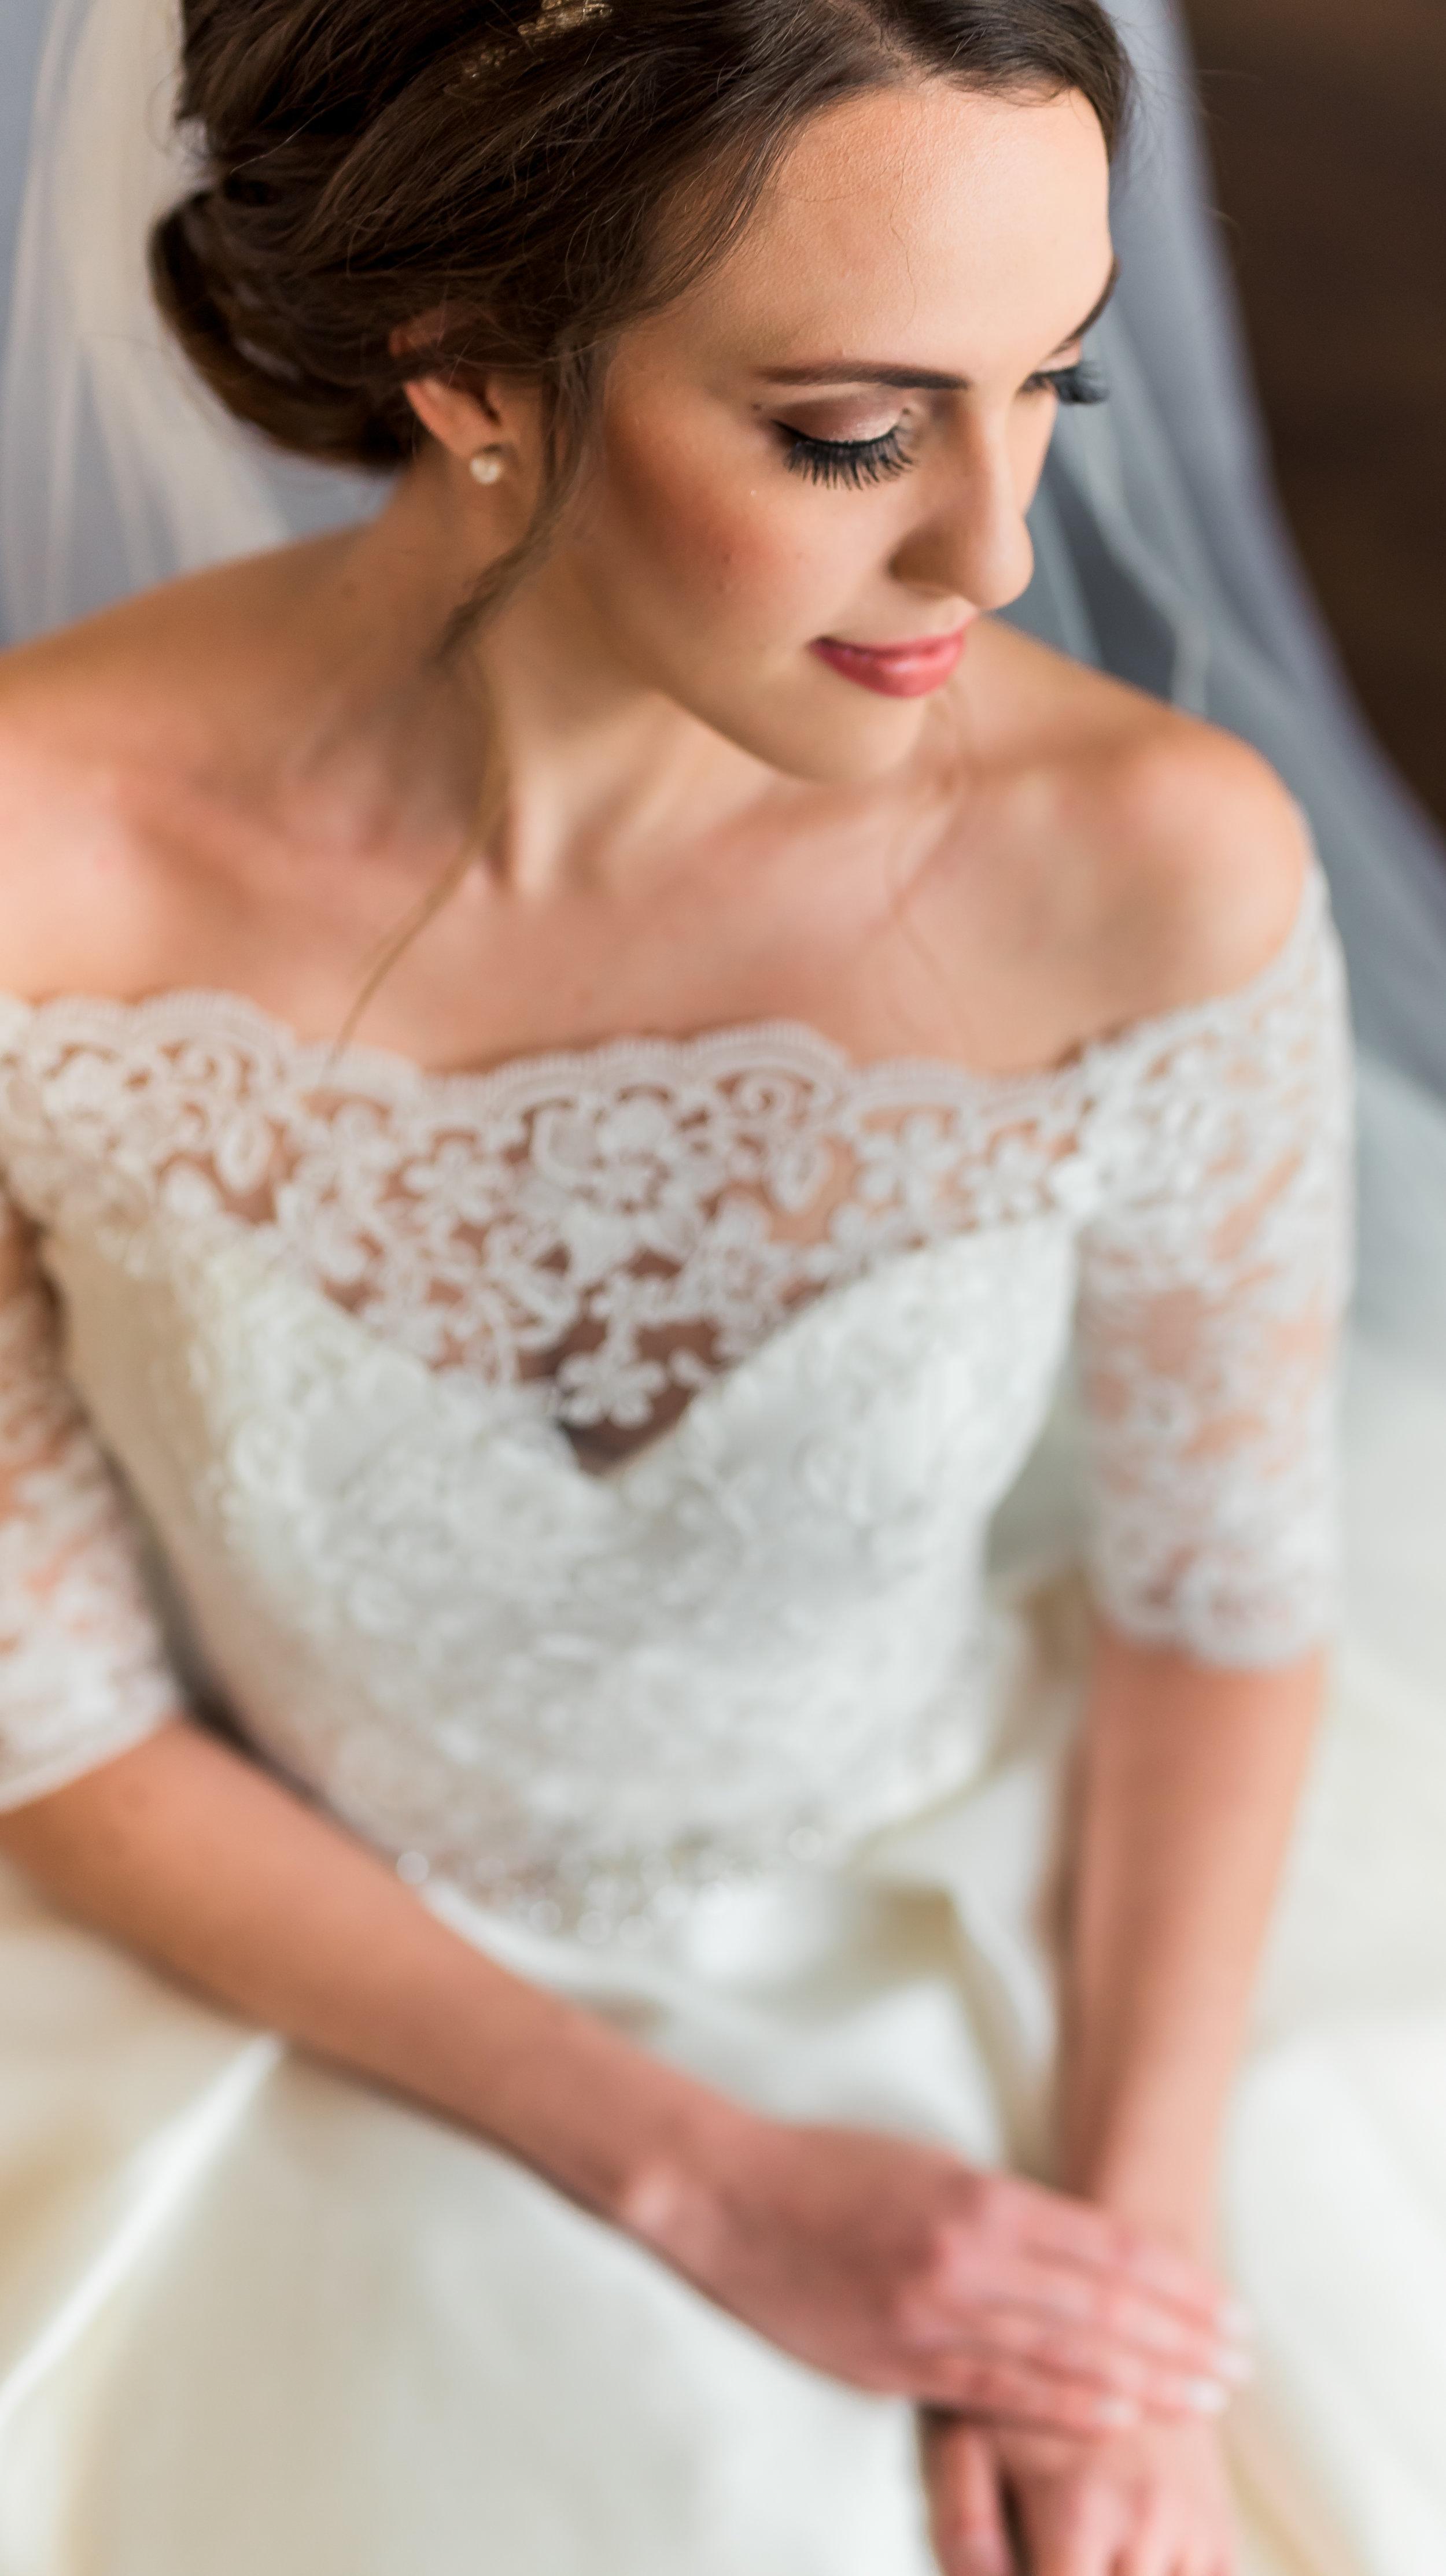 katy-wedding-photographer-houston-wedding-photographer-bride-sugar-land-cypress-richmond-spring-bridal-portraits-5.jpg